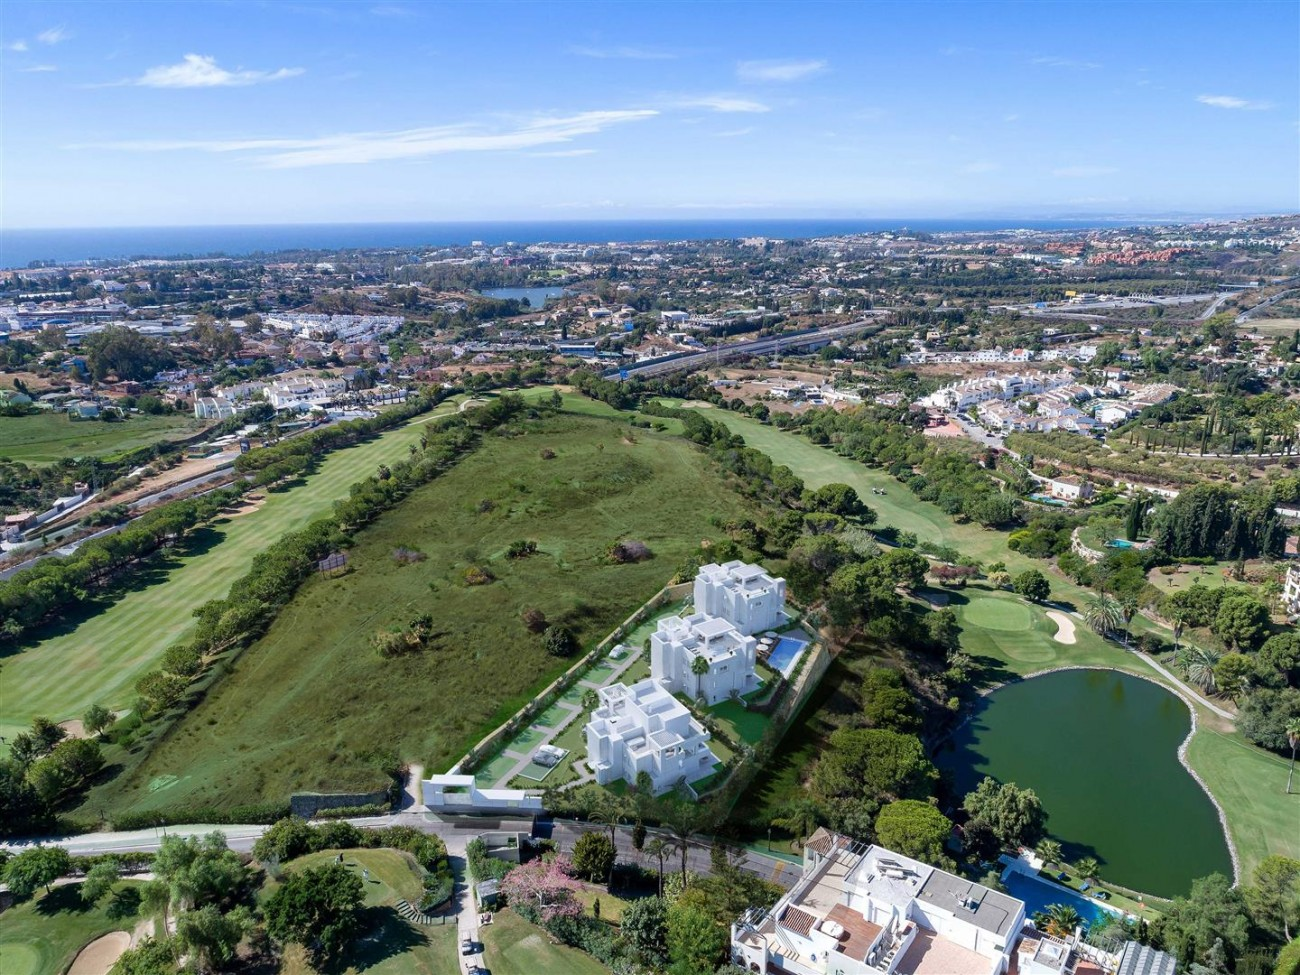 New Contemporary Apartments for sale Benahavis Spain (23) (Large)